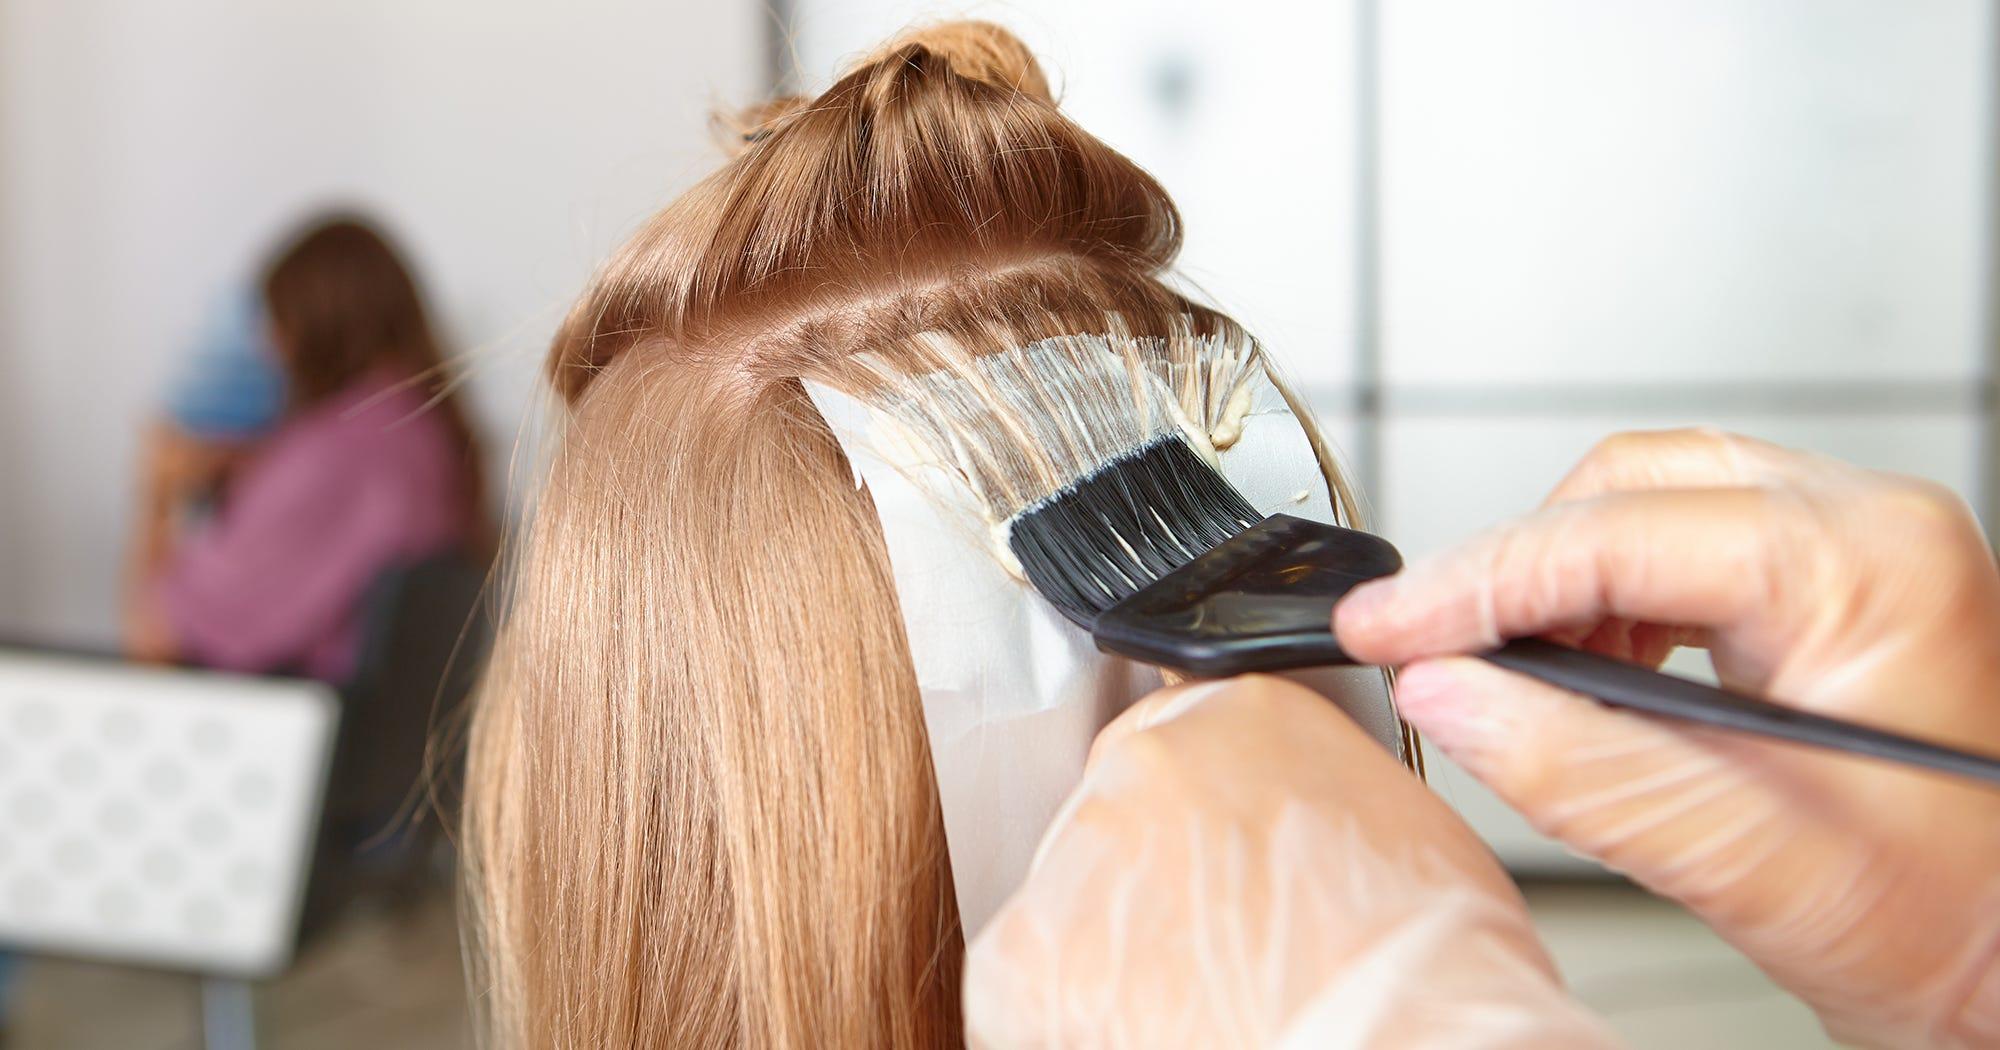 Japanese Student Sues School Forced Dye Hair Black